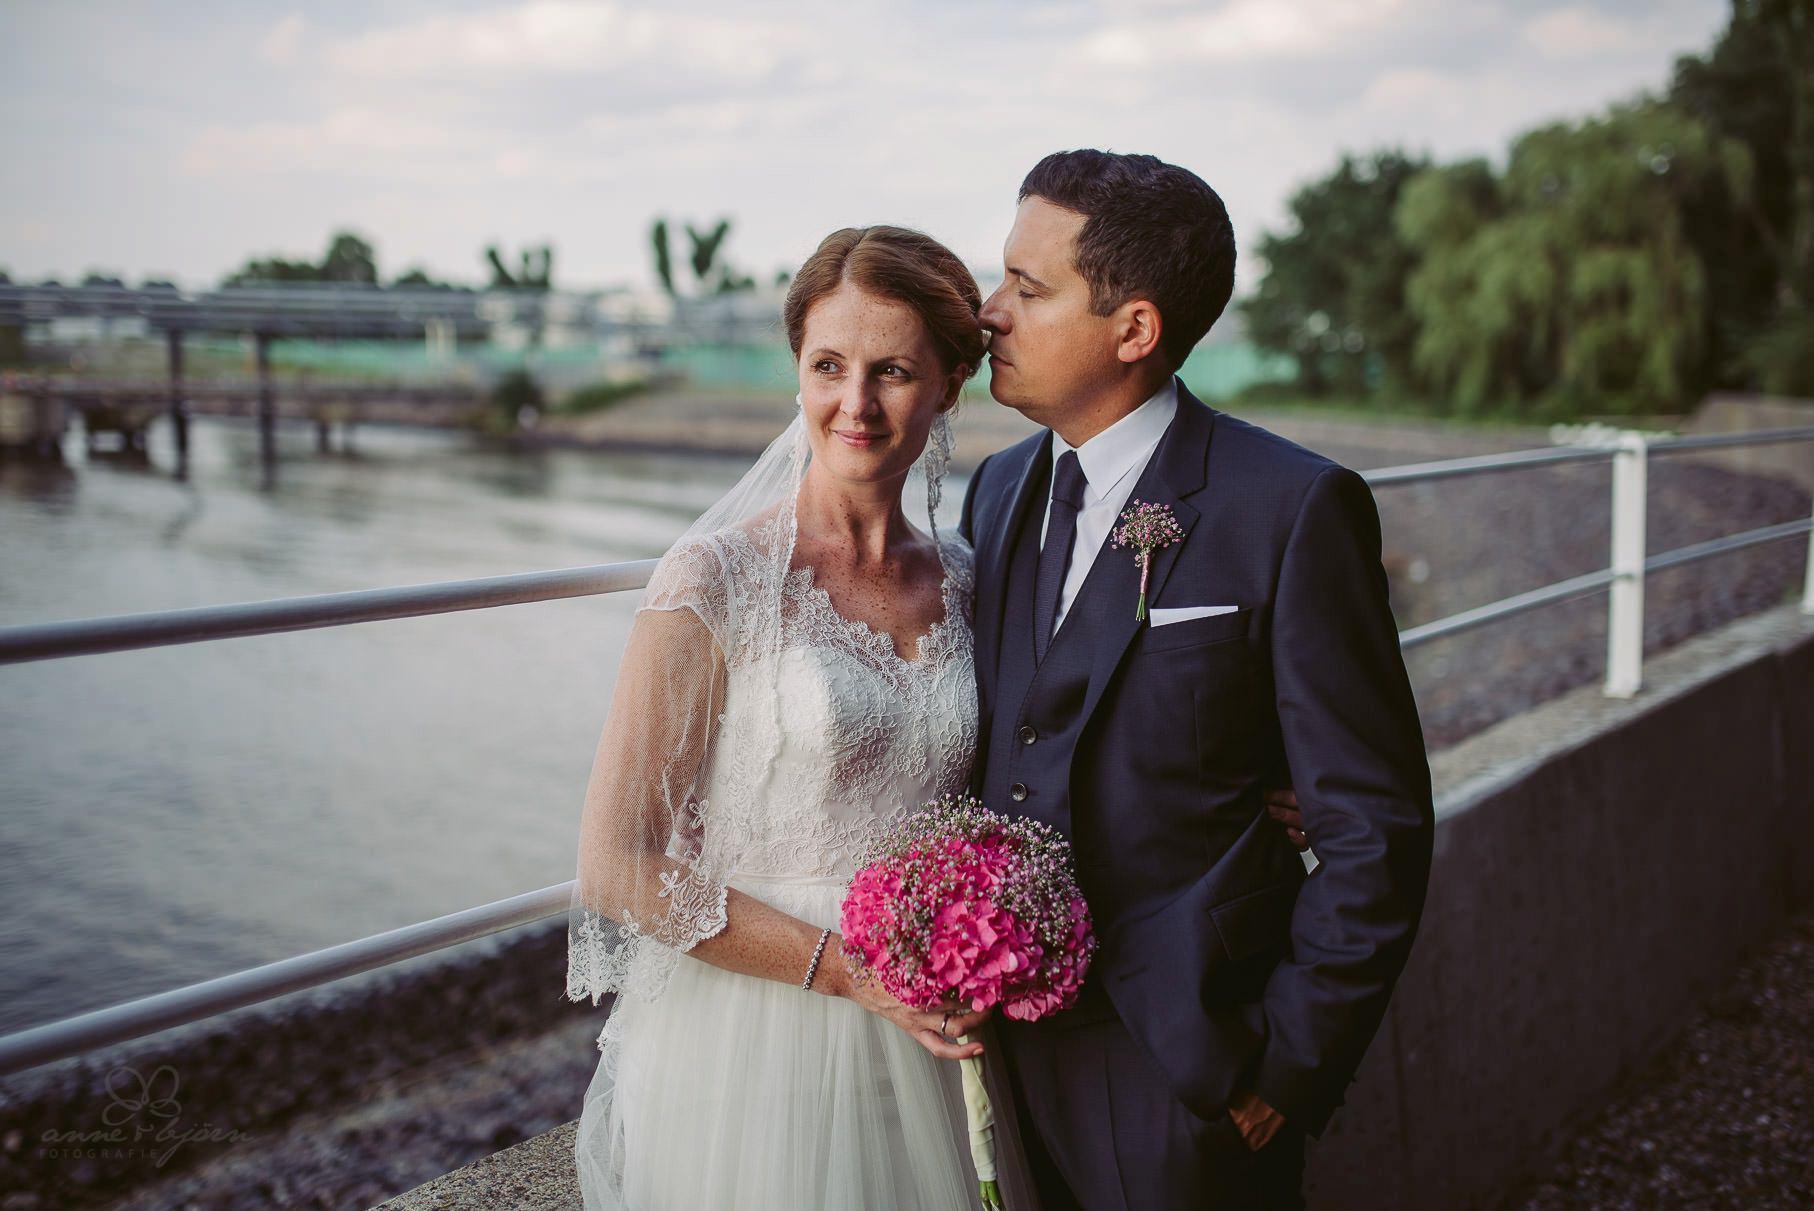 0081 aud blog d75 2730 - Hochzeit an der Hamburger Elbe - Ann-Katrin & Daniel